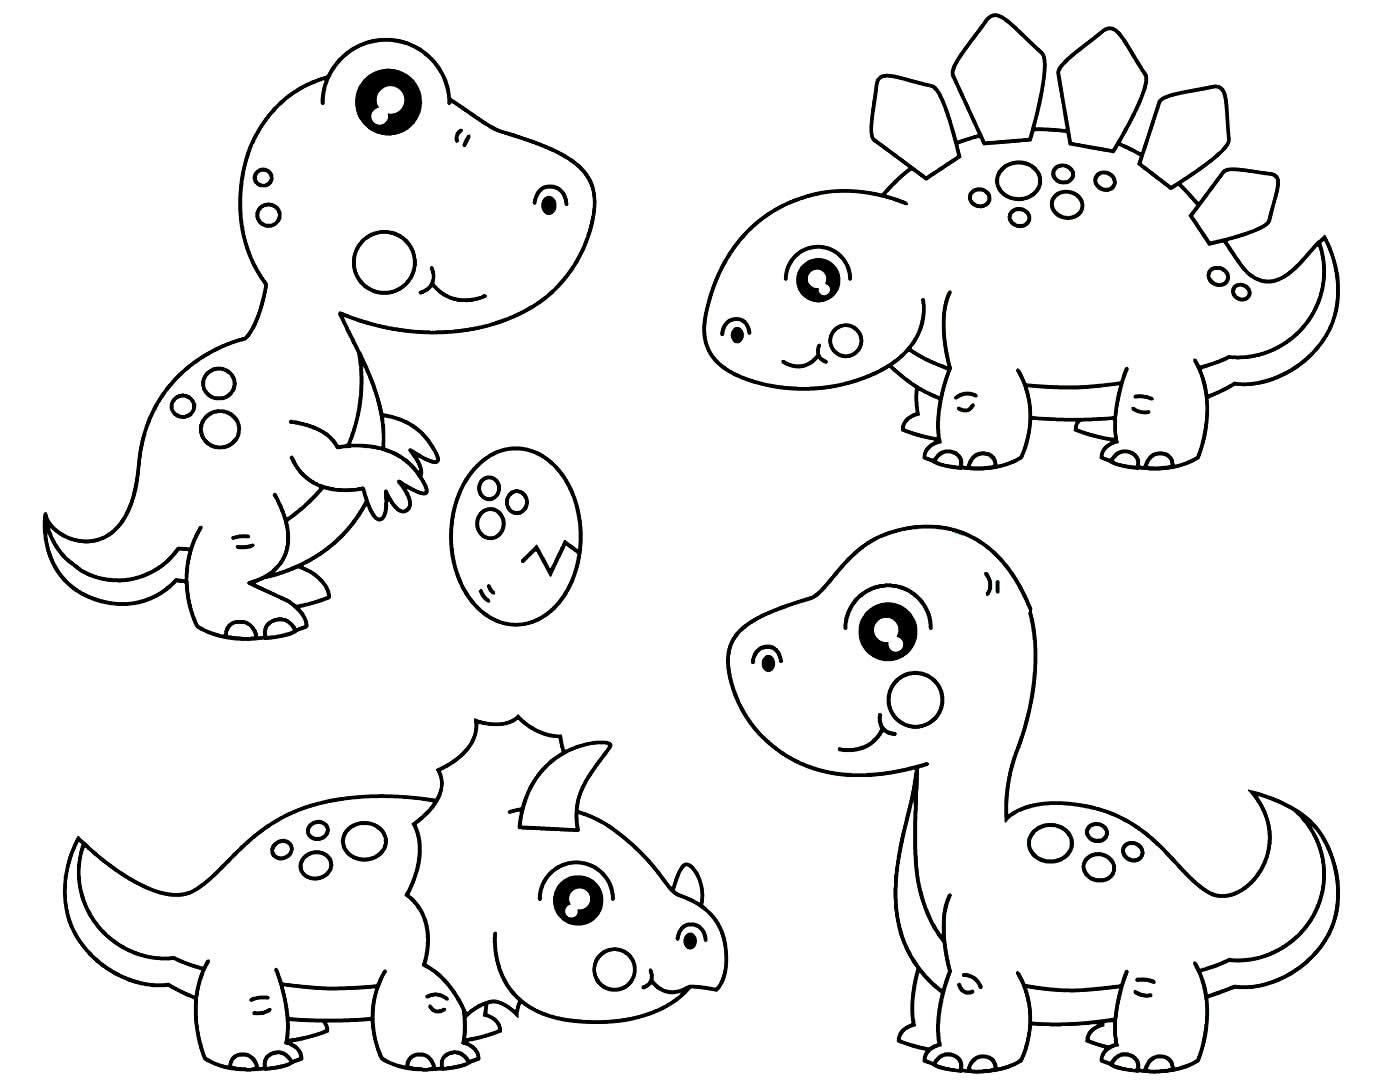 Moldes de dinossauro para píntar